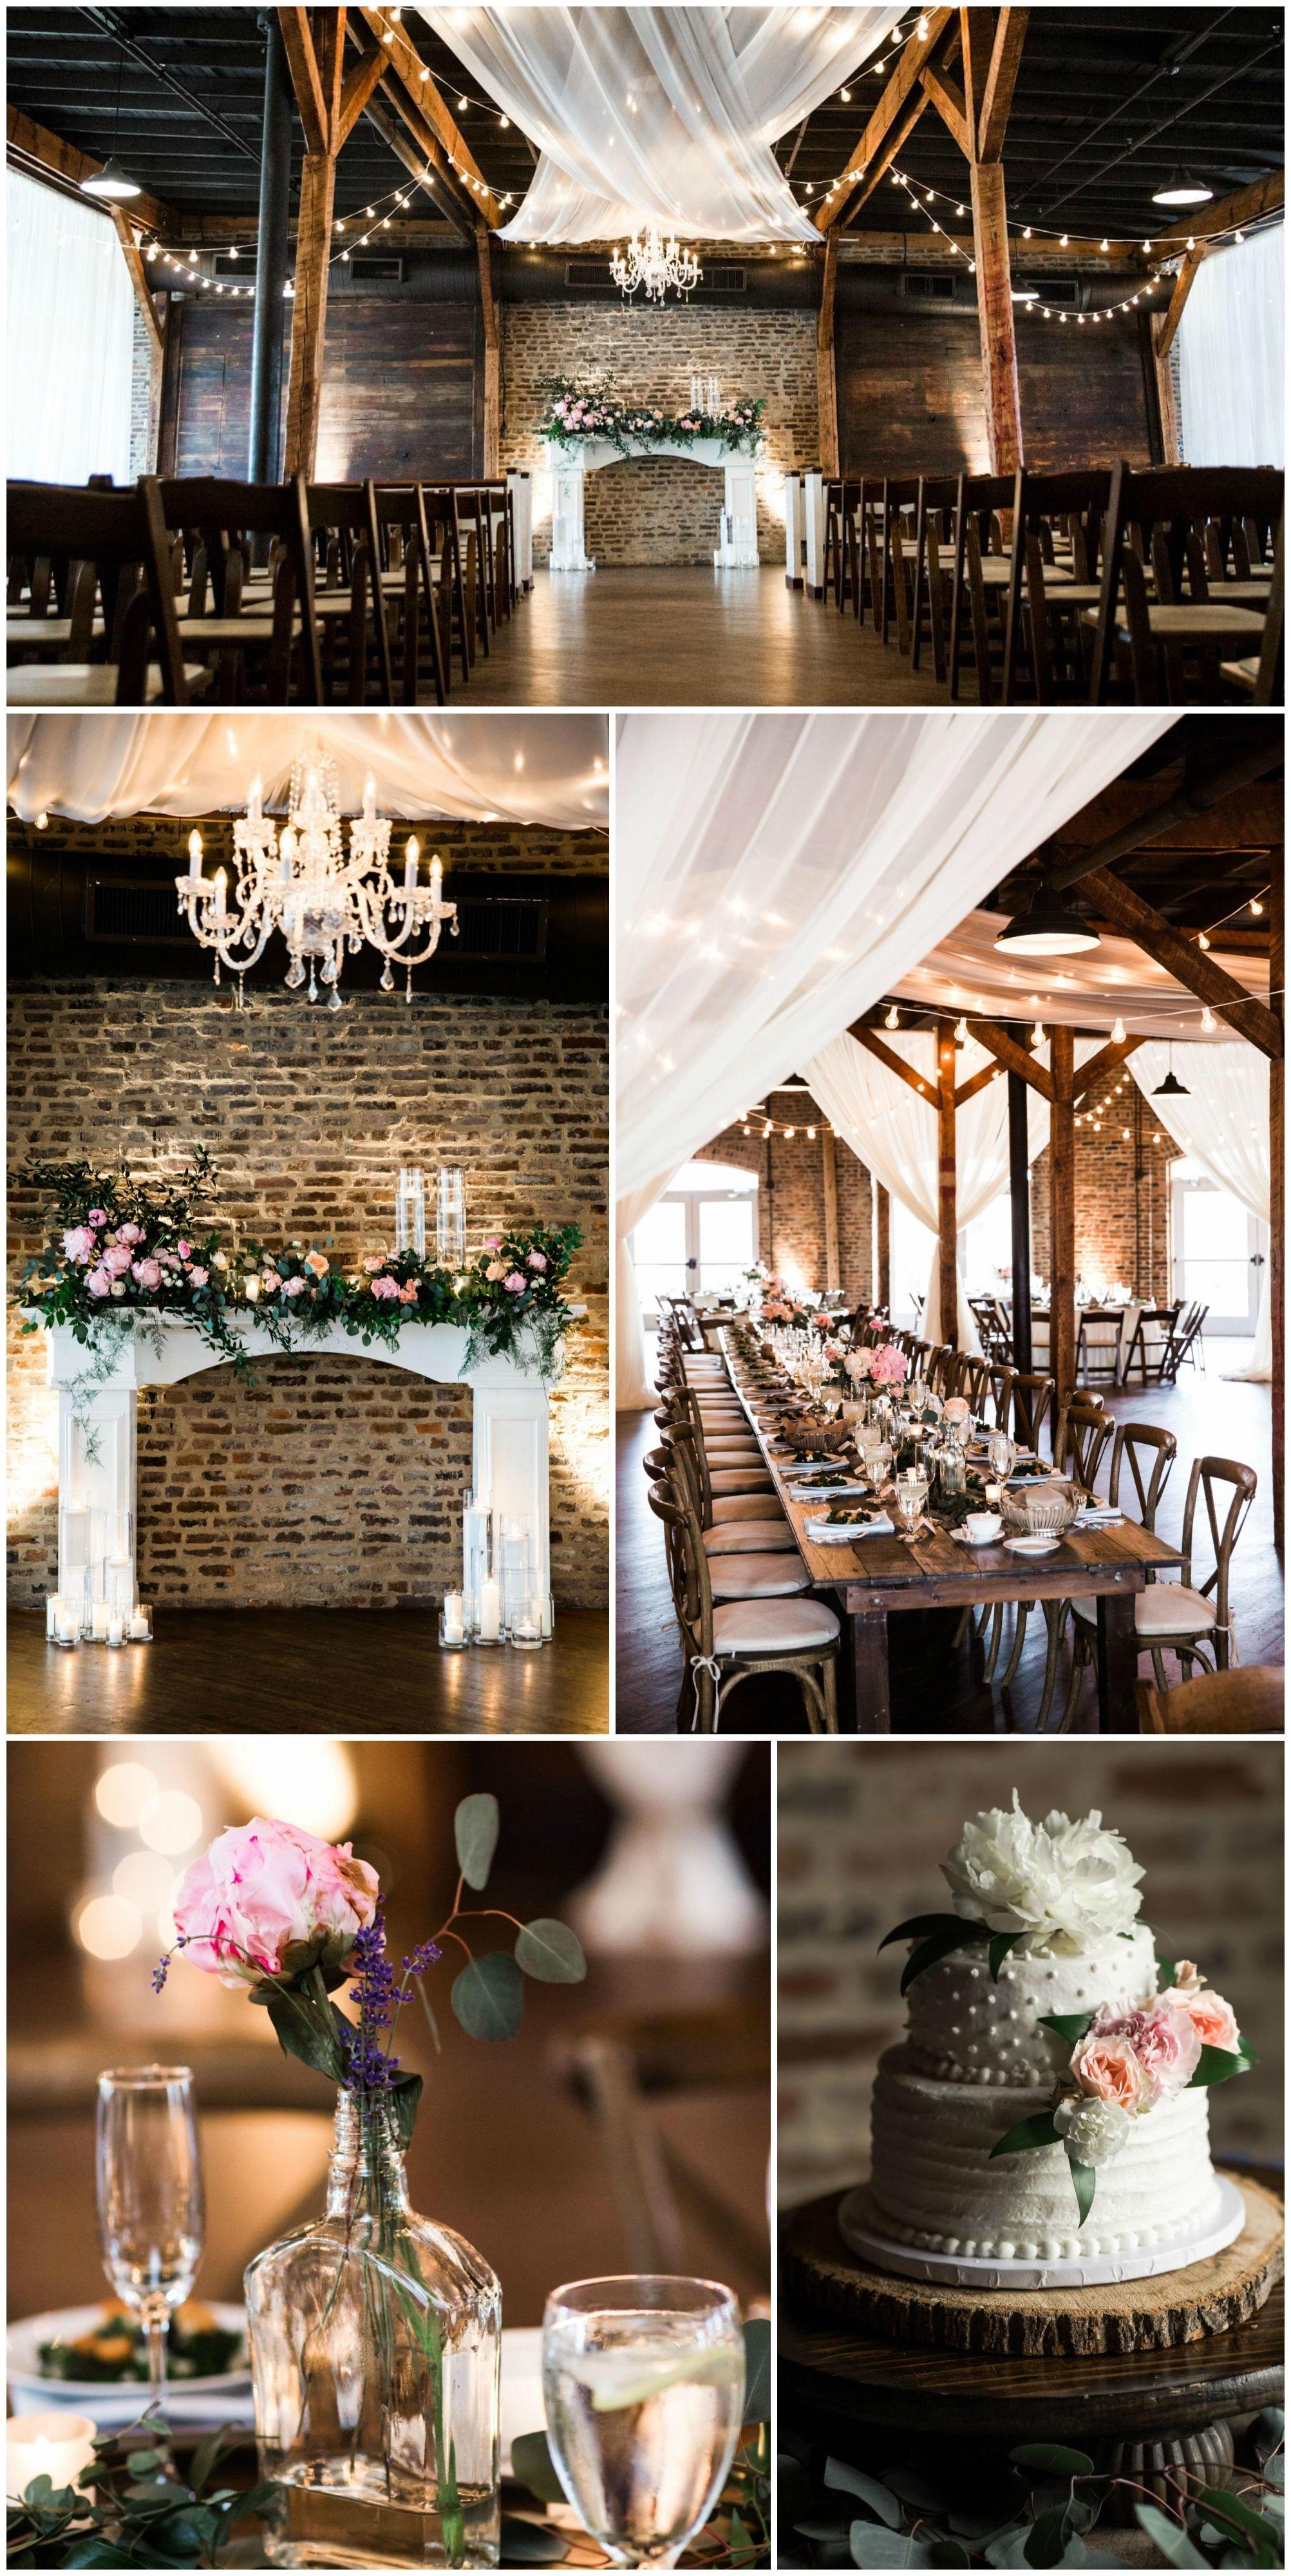 The Smarter Way To Wed Fairytale WeddingsBarn WeddingsThemed WeddingsRustic Vintage Romance